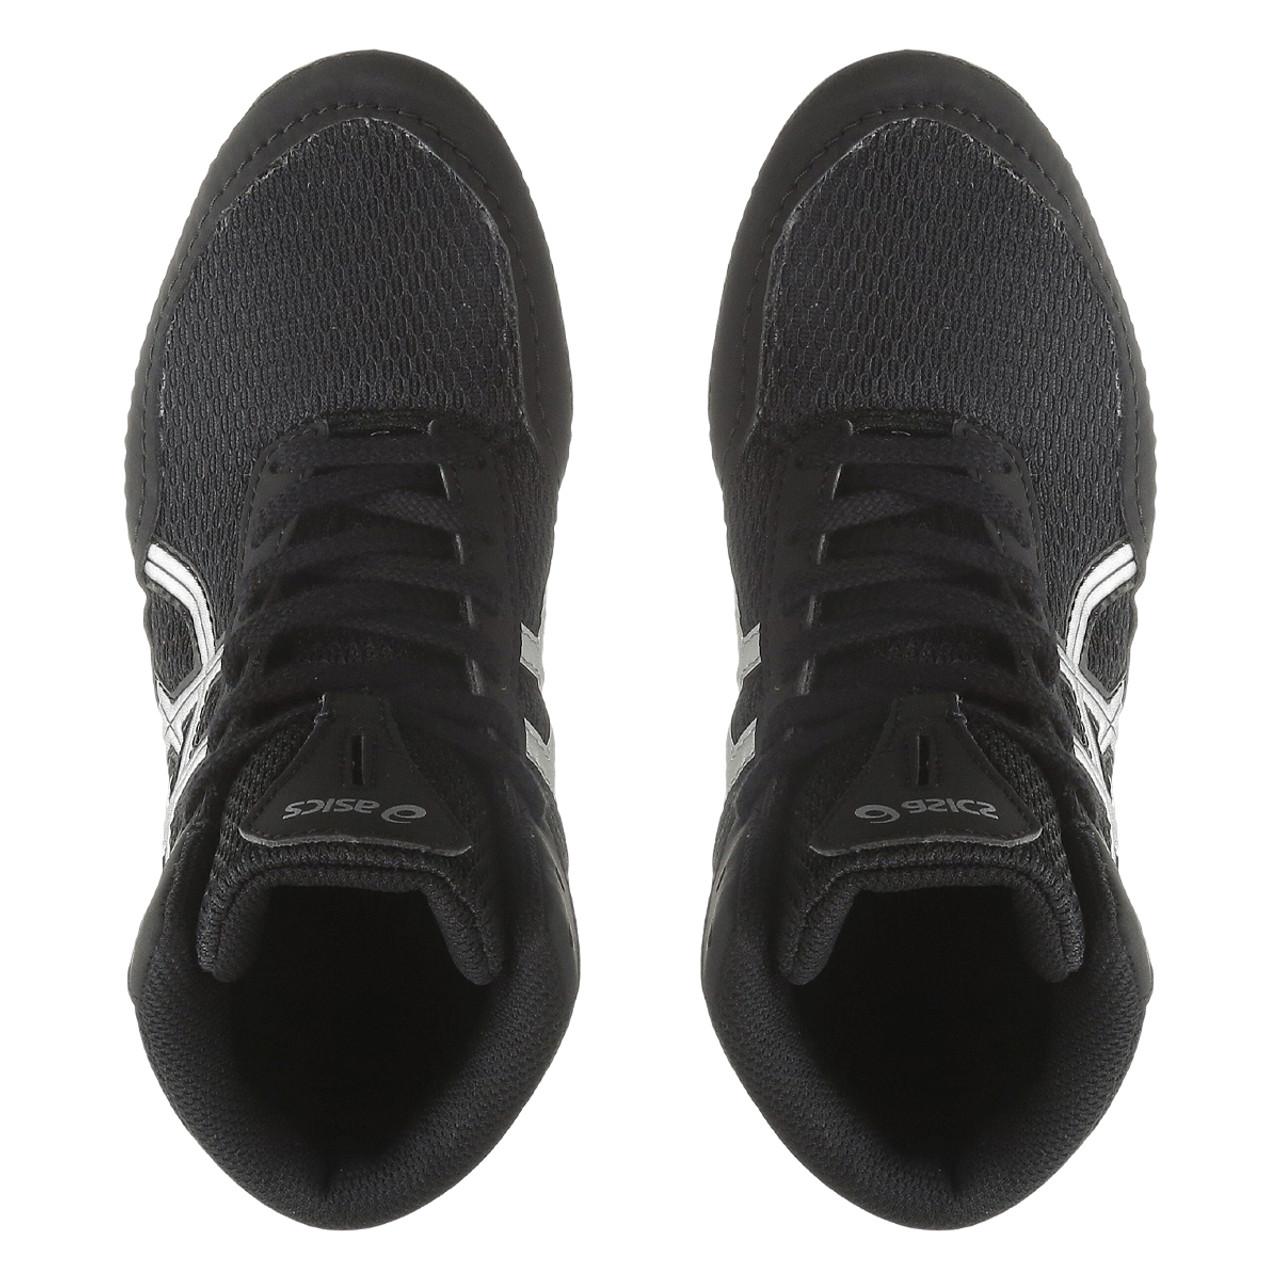 Asics Matflex 5 GS Junior Wrestling Shoes - Black 7a94f1ceb